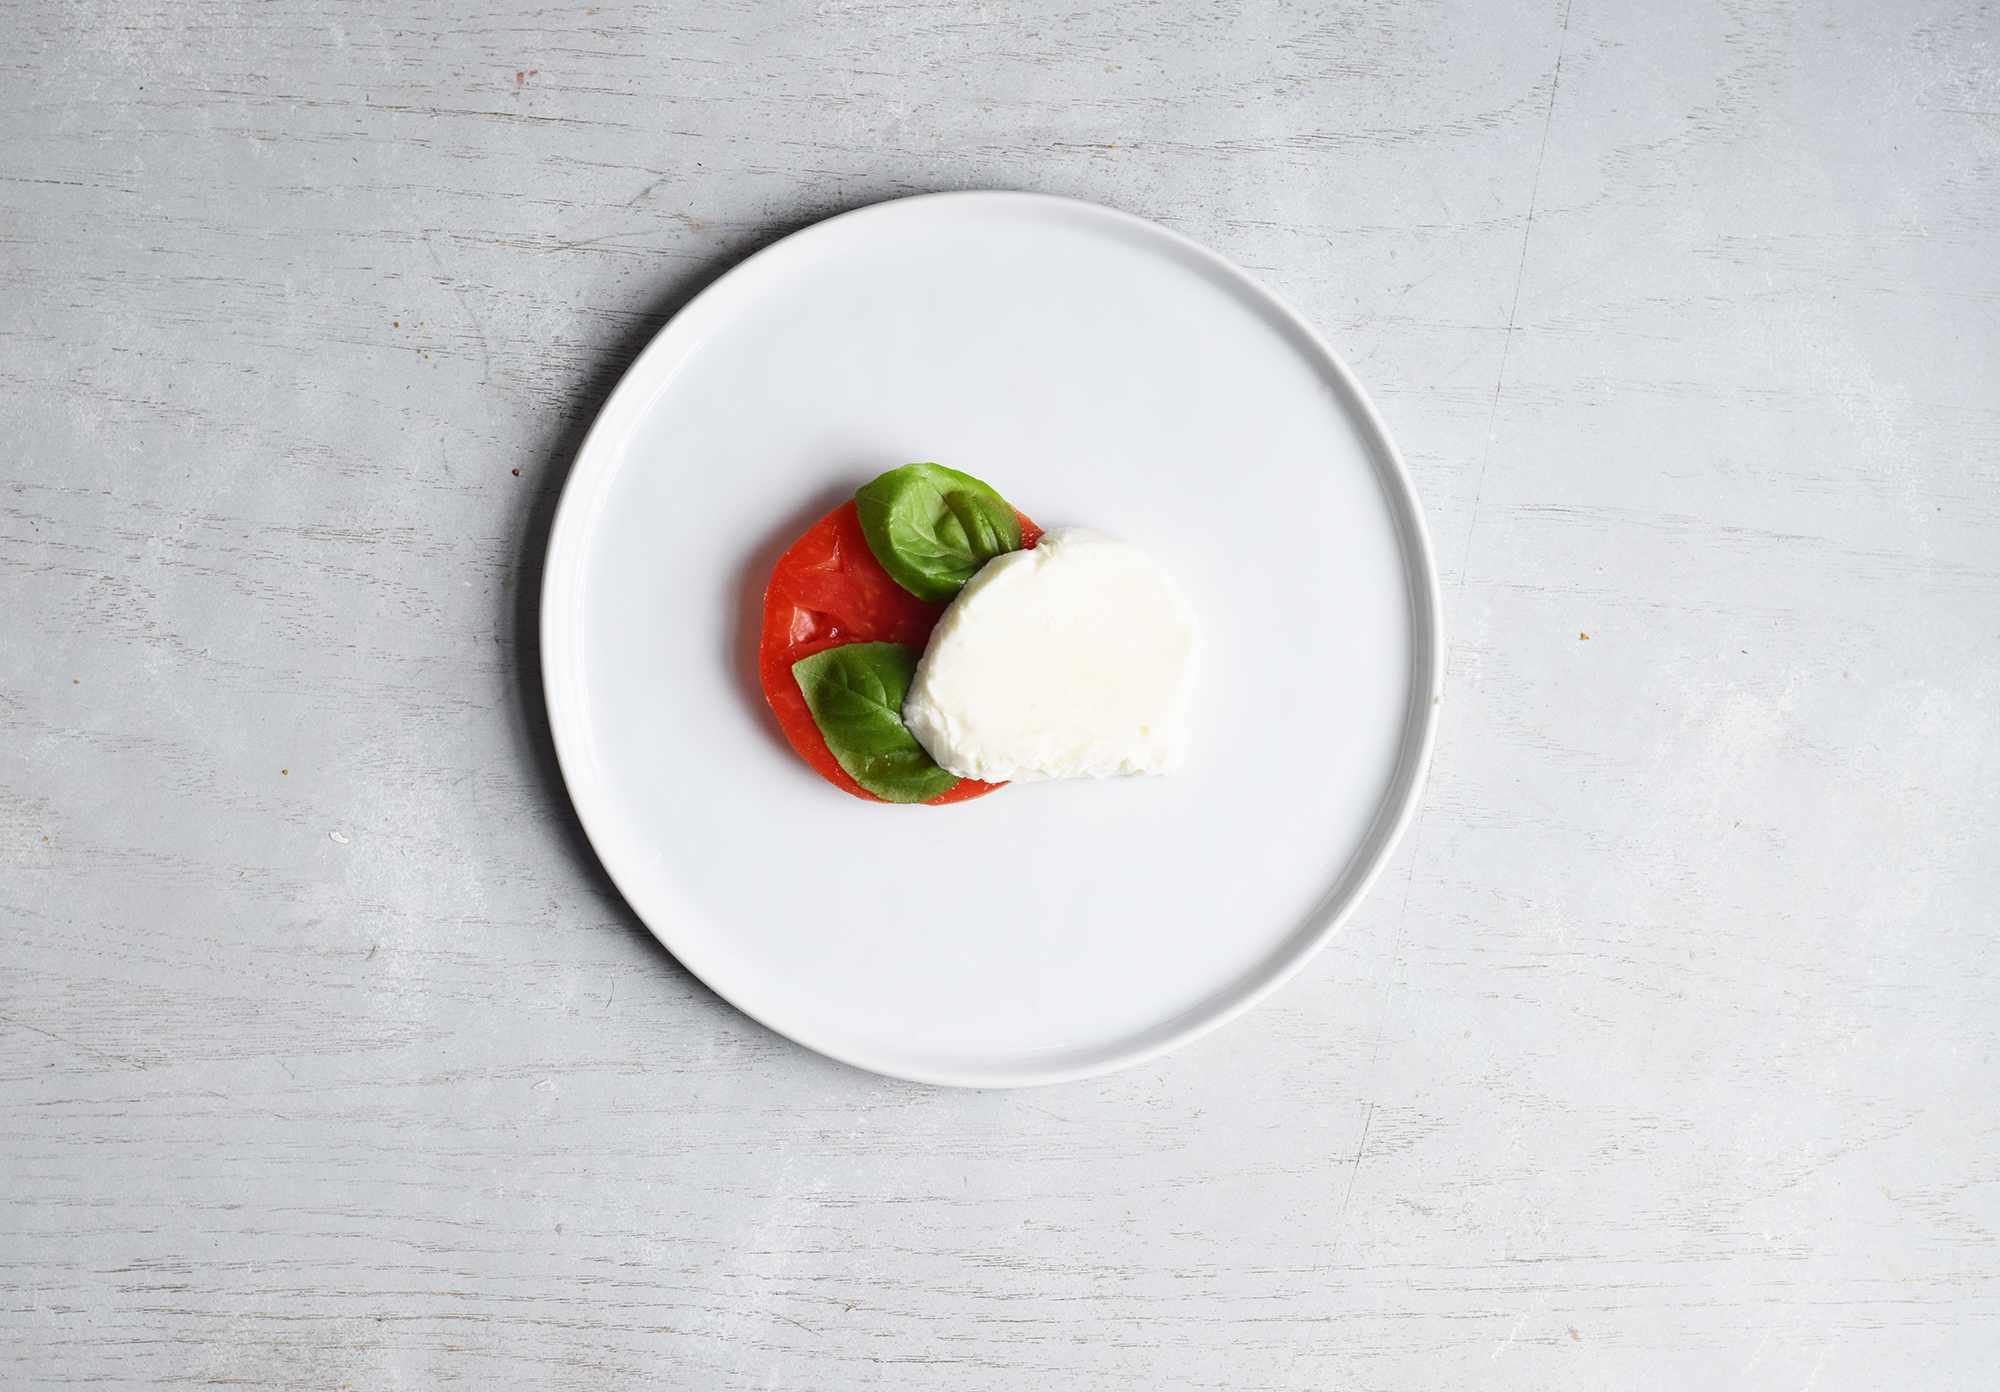 layering mozzarella cheese with tomatoes and basil